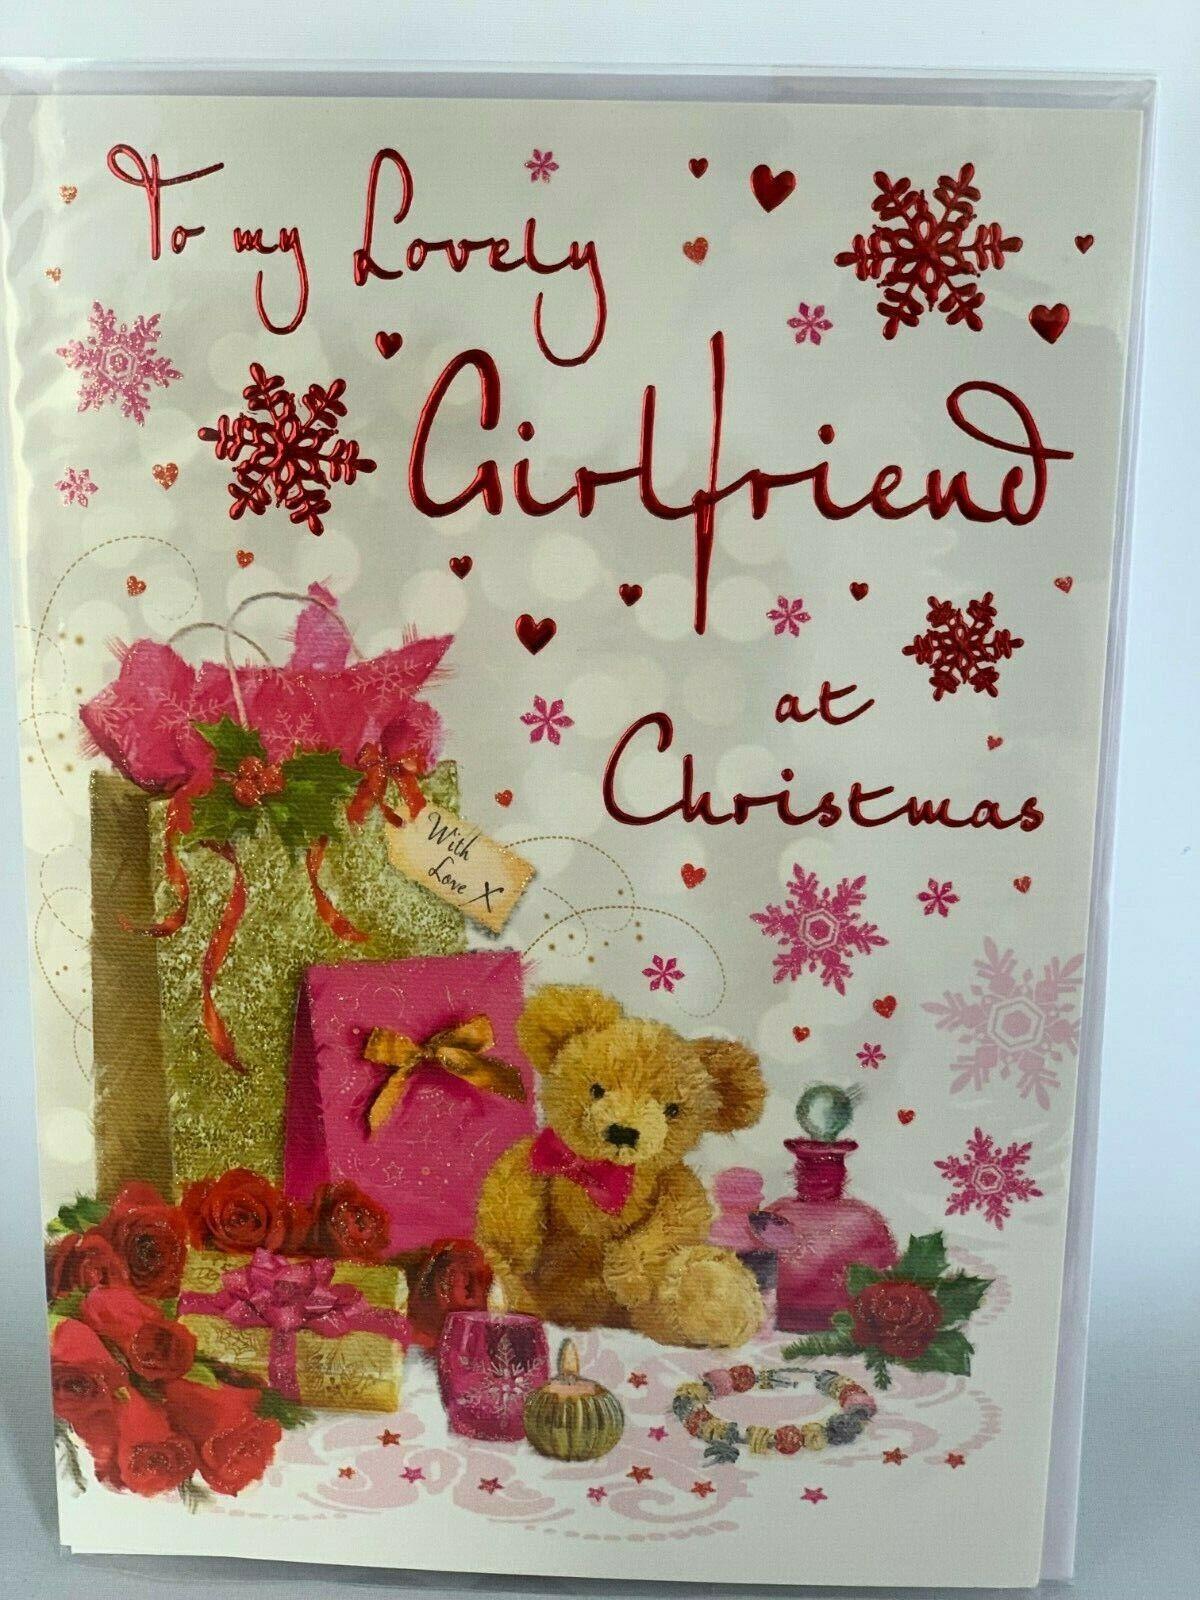 GIRLFRIEND GLITTER CARD CUTE CHRISTMAS WISHES